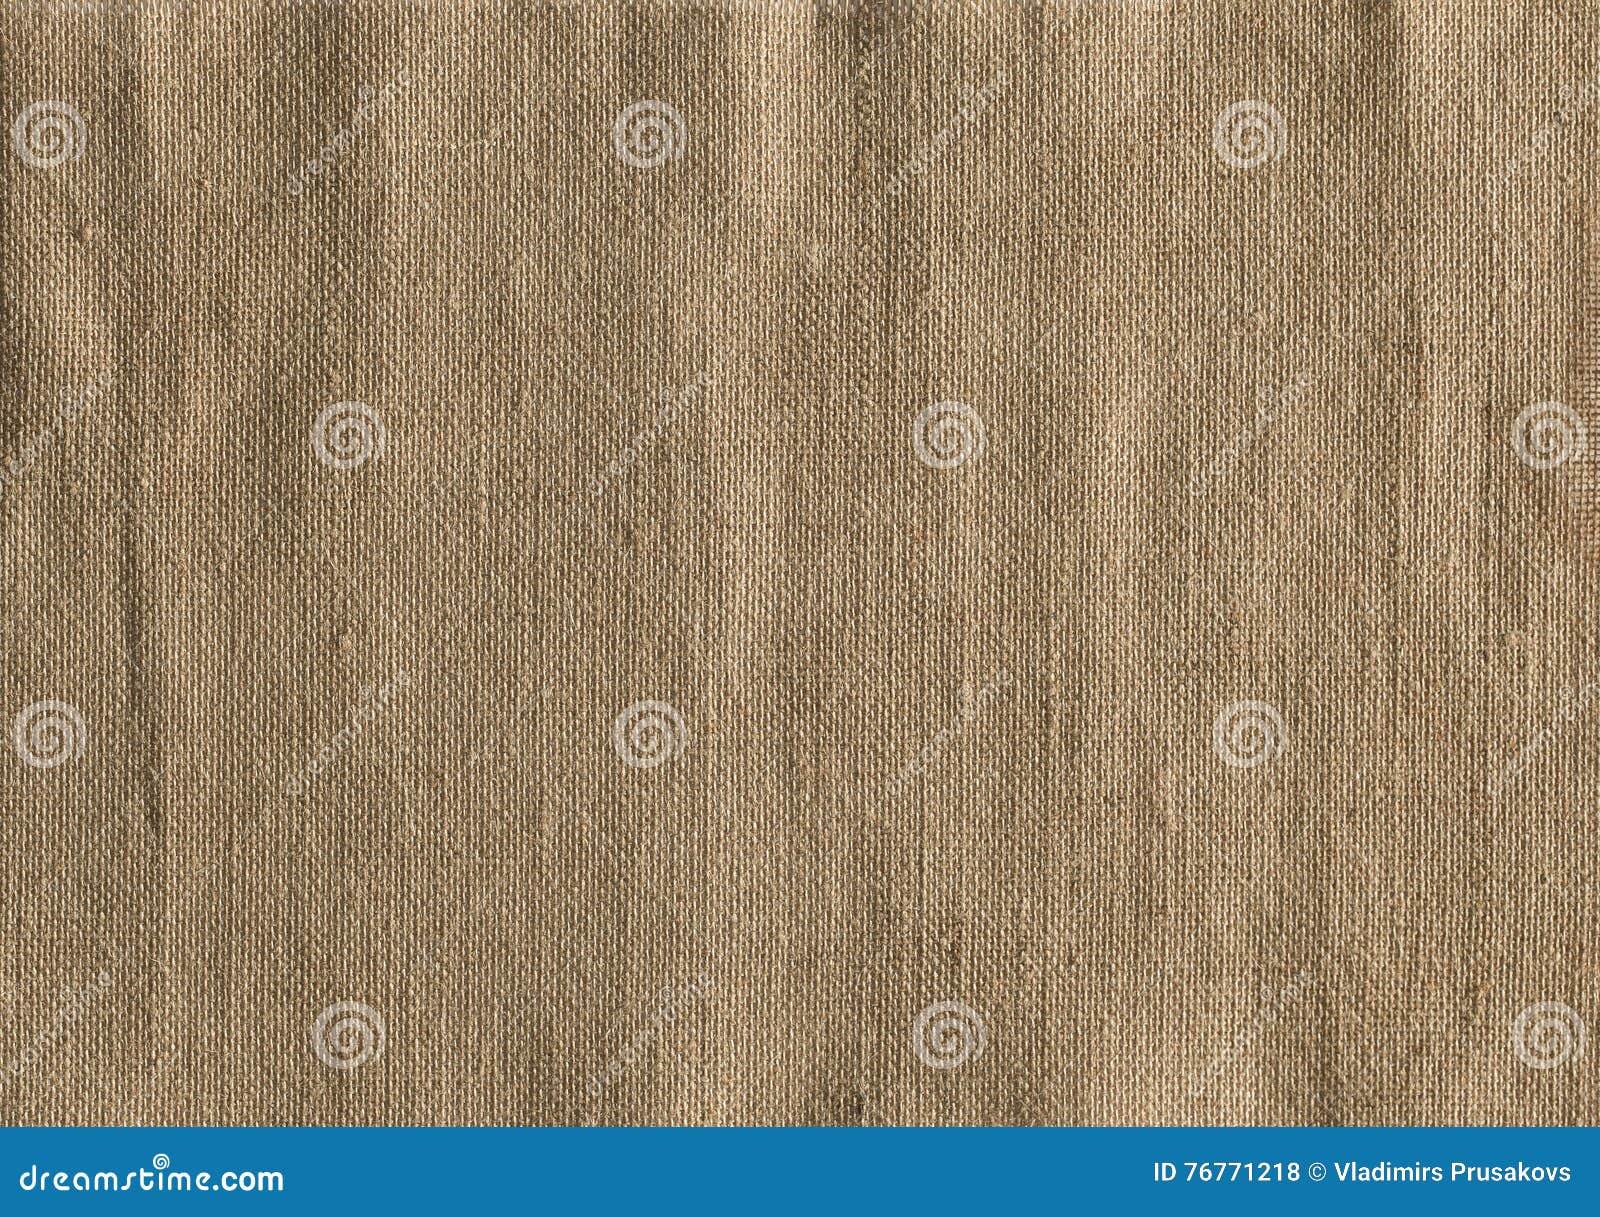 Burlap σύσταση υφάσματος, υπόβαθρο υφασμάτων σάκων γιούτας, Sackcloth